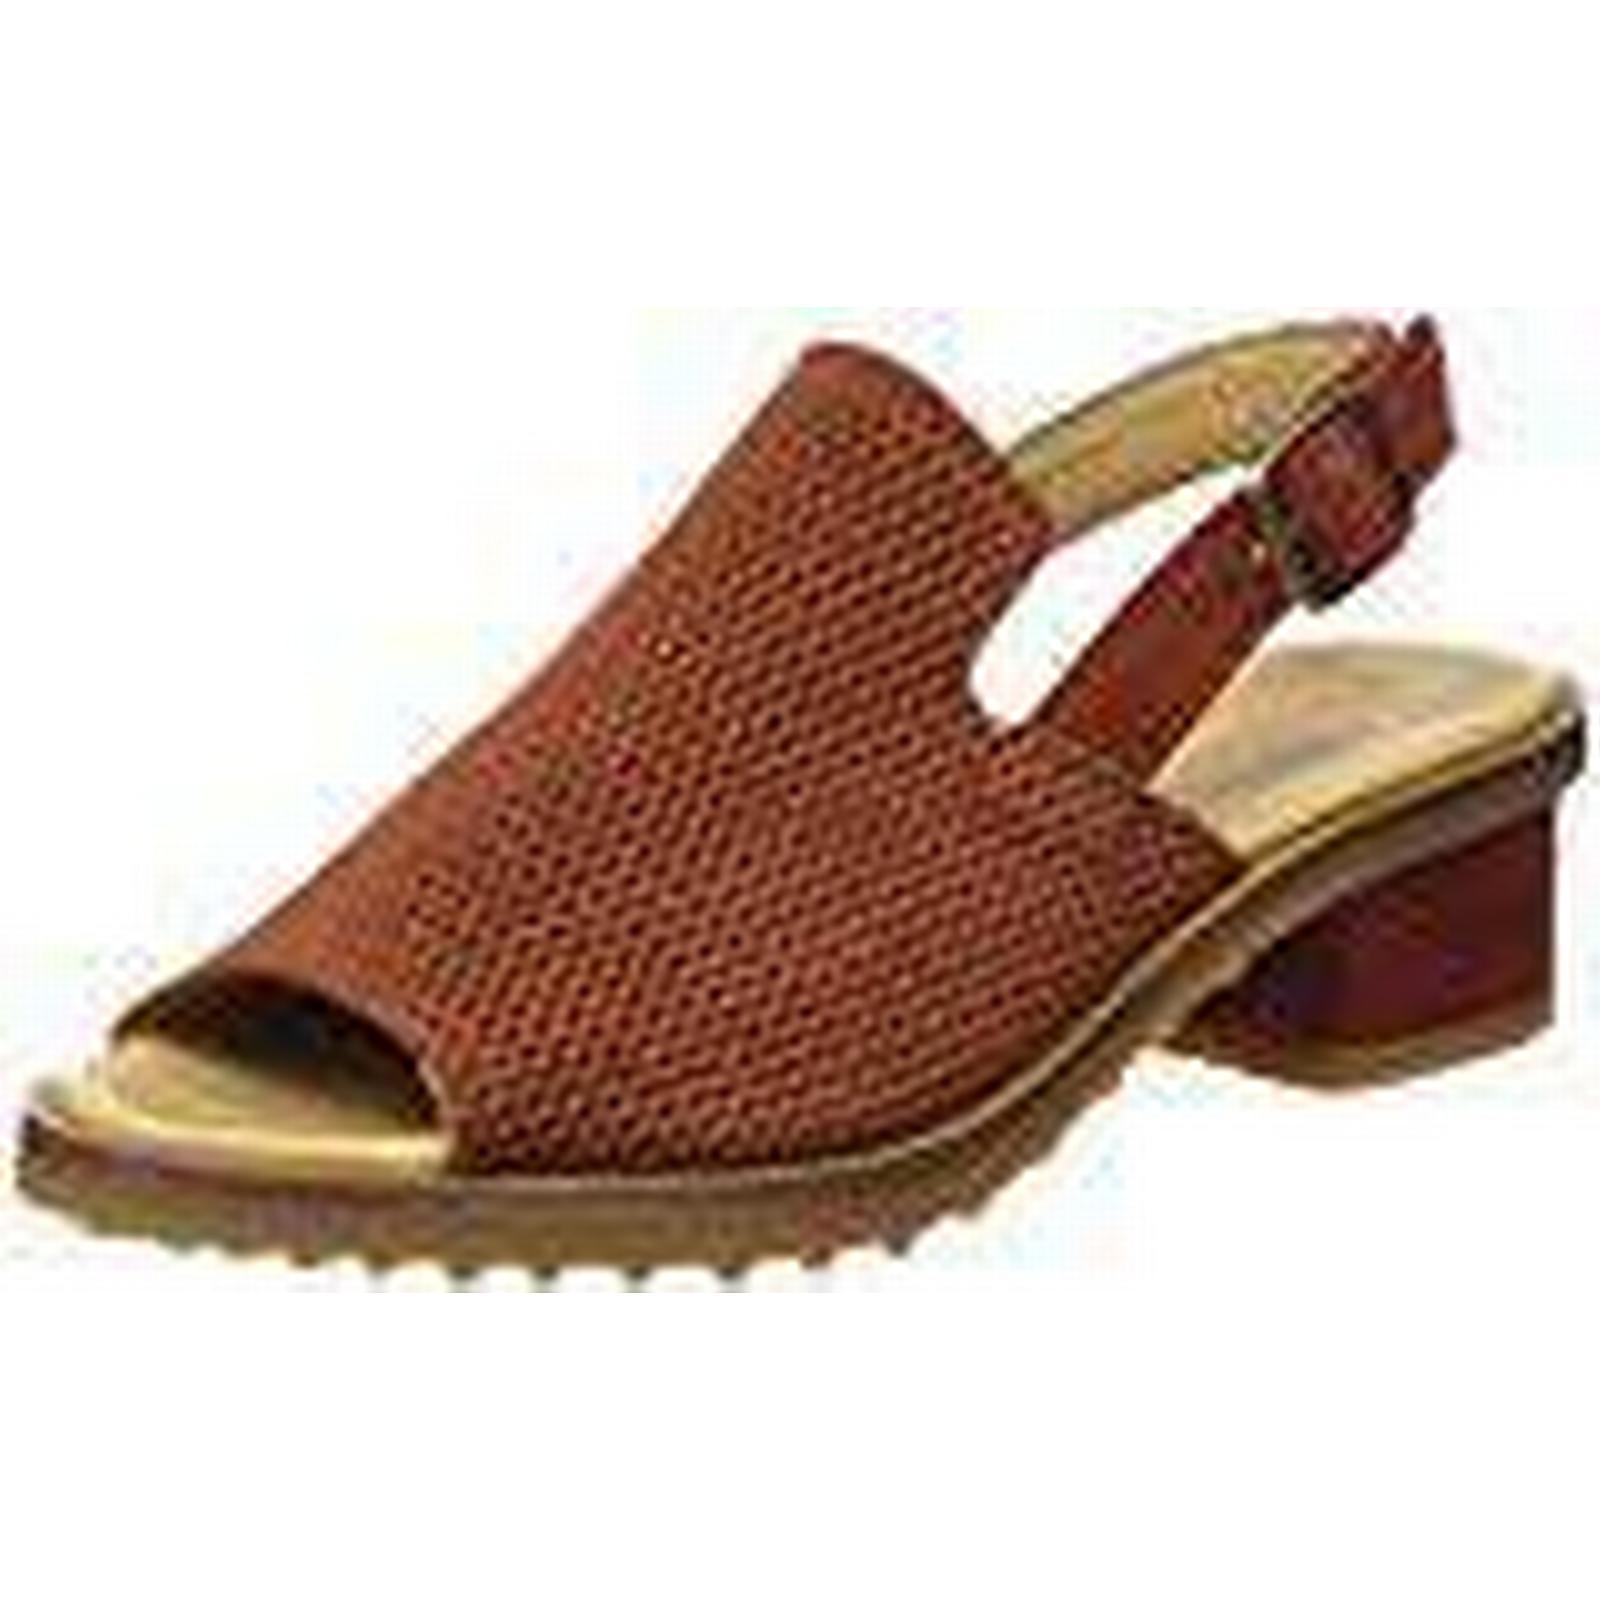 El Naturalista Women's N5014 (Caldera), Open Toe Heels, Red (Caldera), N5014 5 UK 8b783f